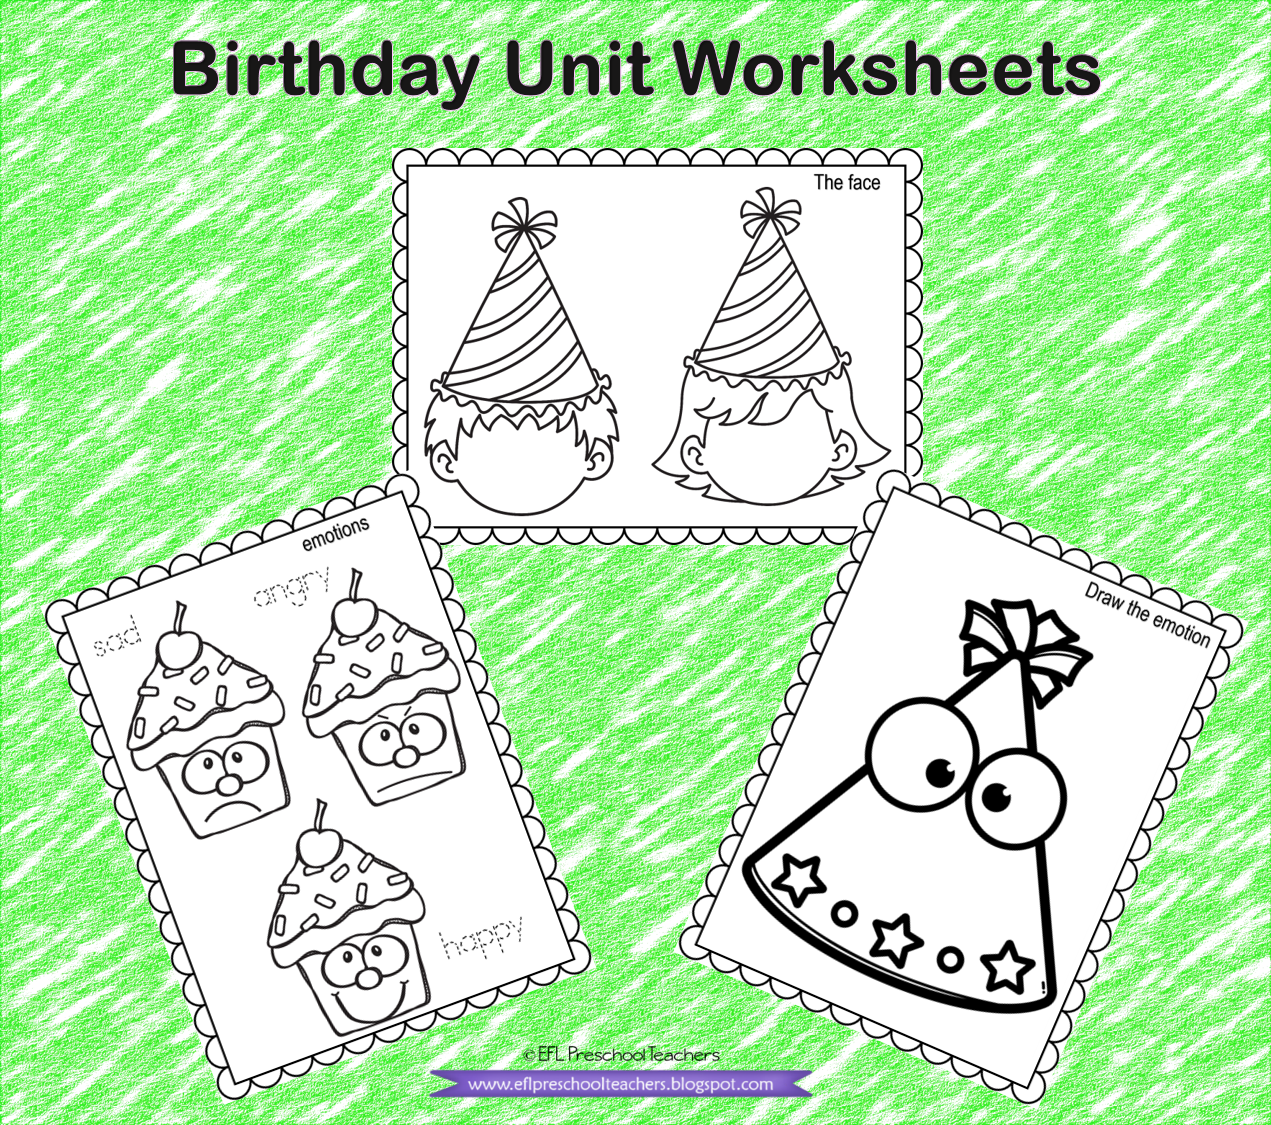 Birthday Unit Worksheets For Kindergarten Ell In 2021 Kindergarten Worksheets Kindergarten Ell Birthday [ 1125 x 1271 Pixel ]